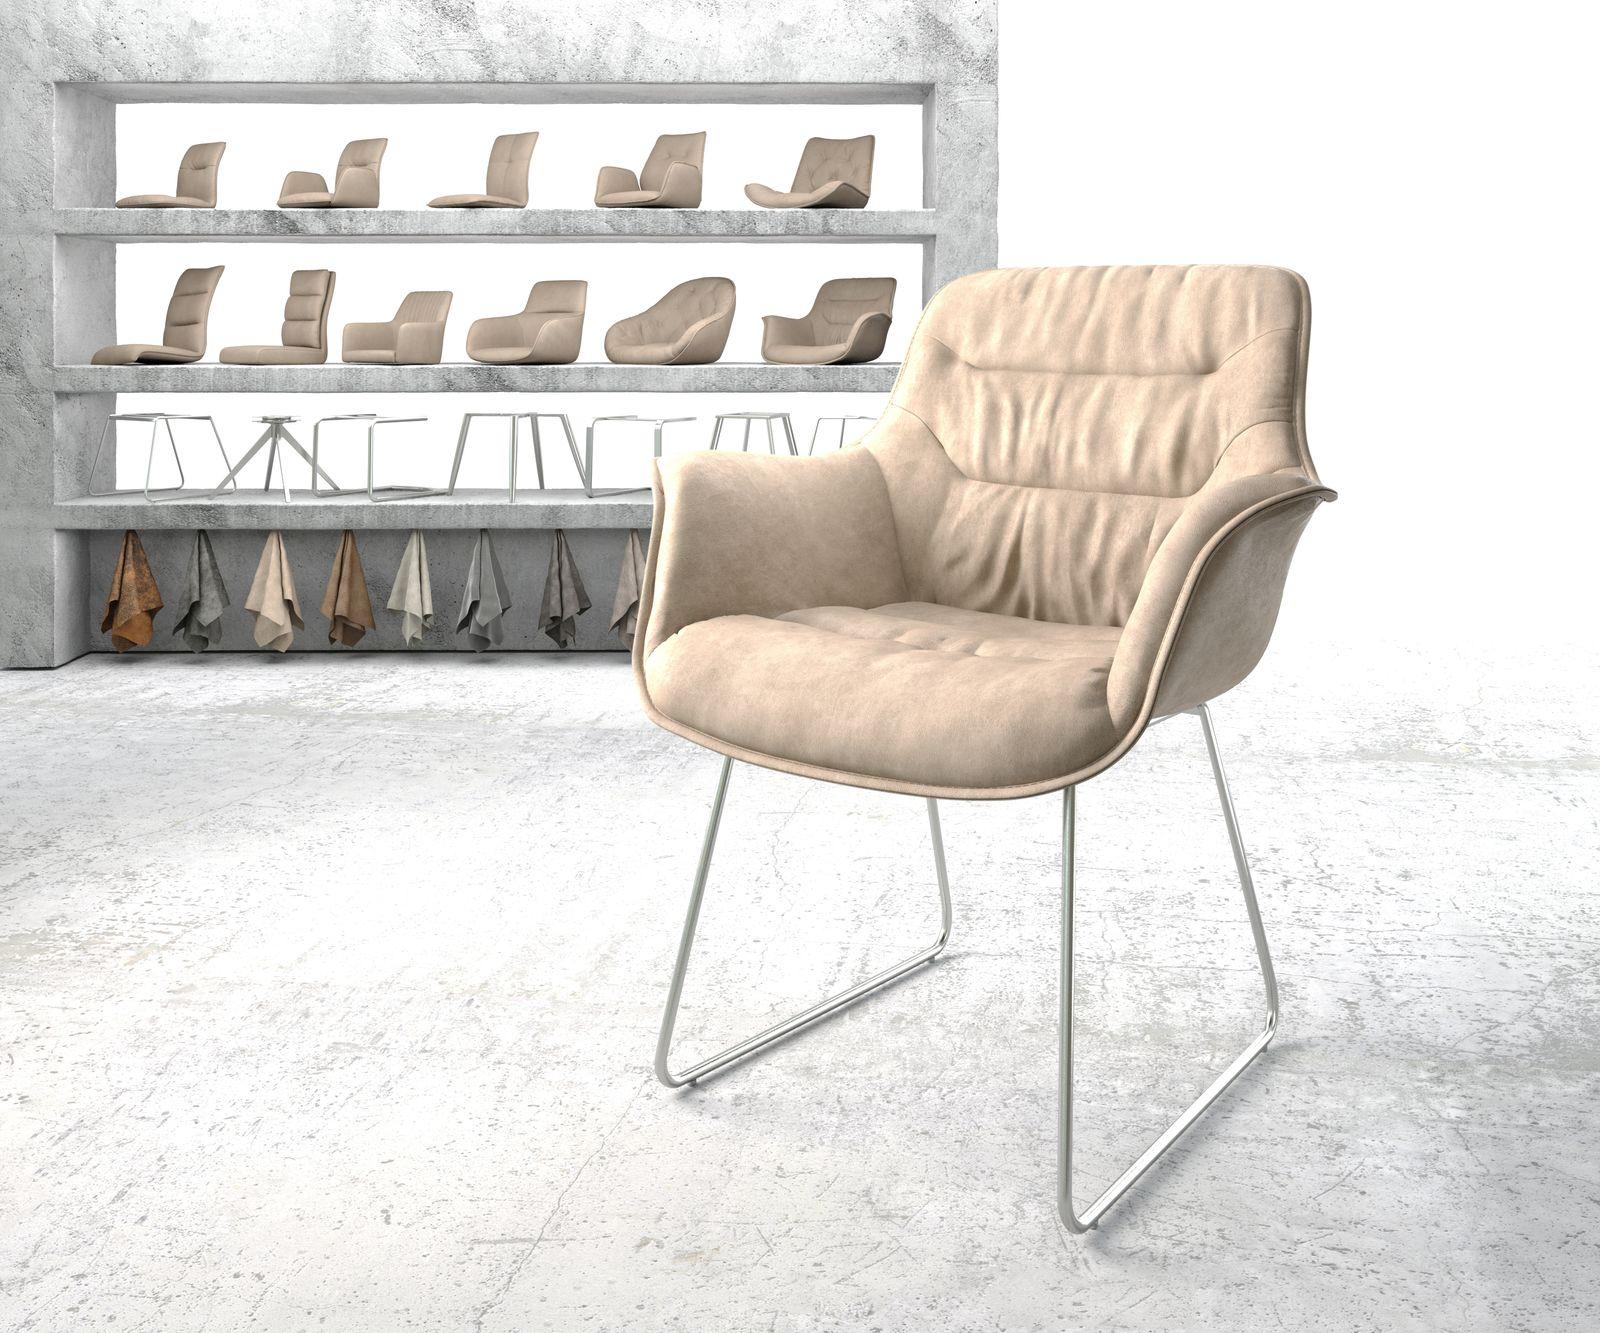 delife-armlehnstuhl-kaira-flex-beige-vintage-kufengestell-edelstahl-esszimmerstuhle